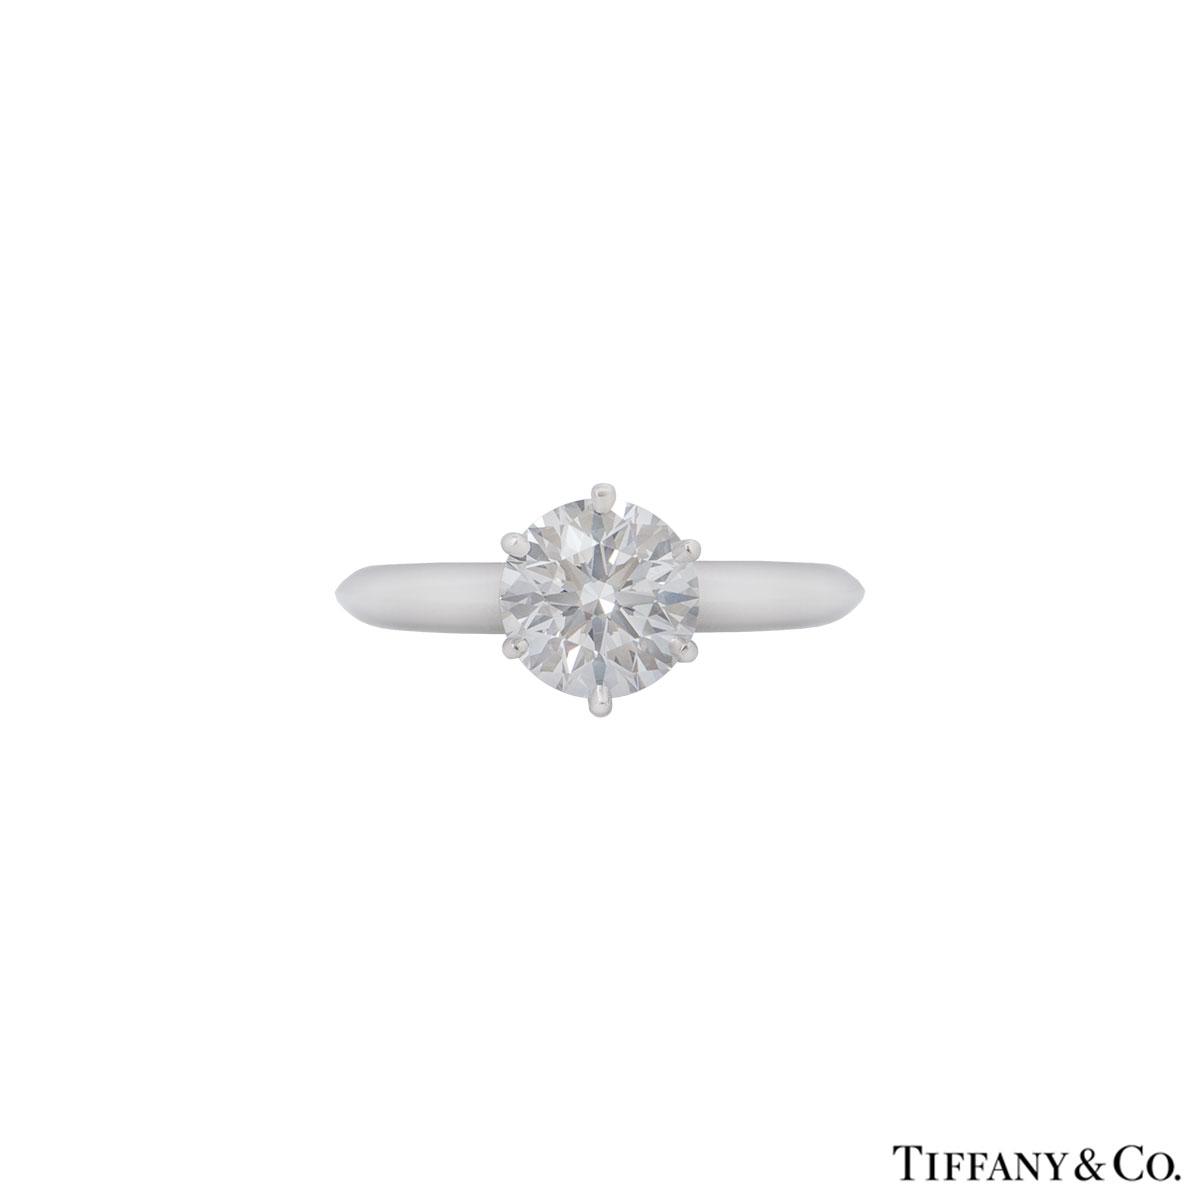 Tiffany & Co. Platinum Diamond Setting Ring 1.22ct D/VS1 XXX